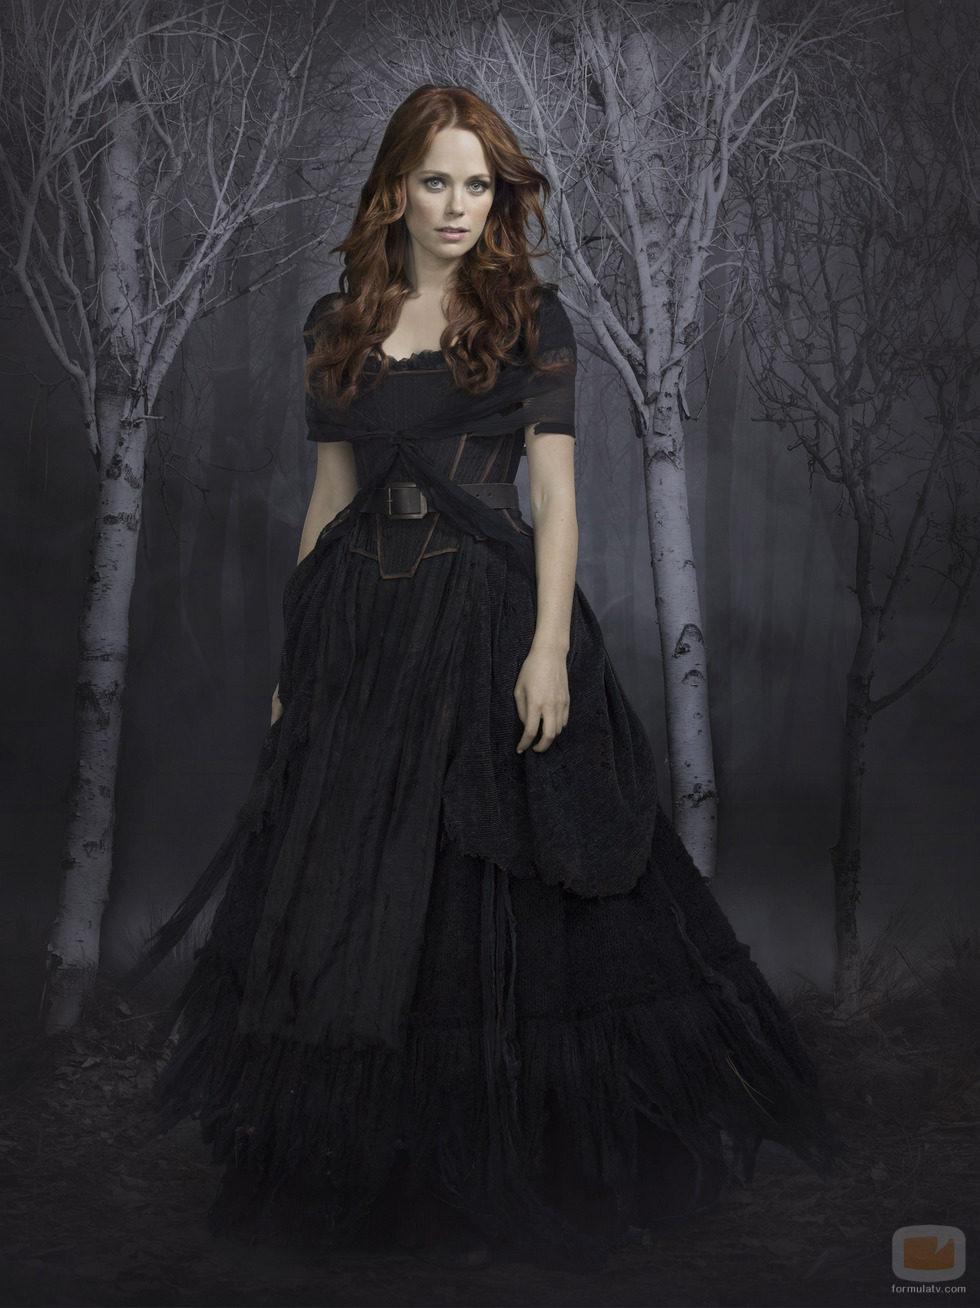 Katia Winter interpreta a Katrina Crane en 'Sleepy Hollow'